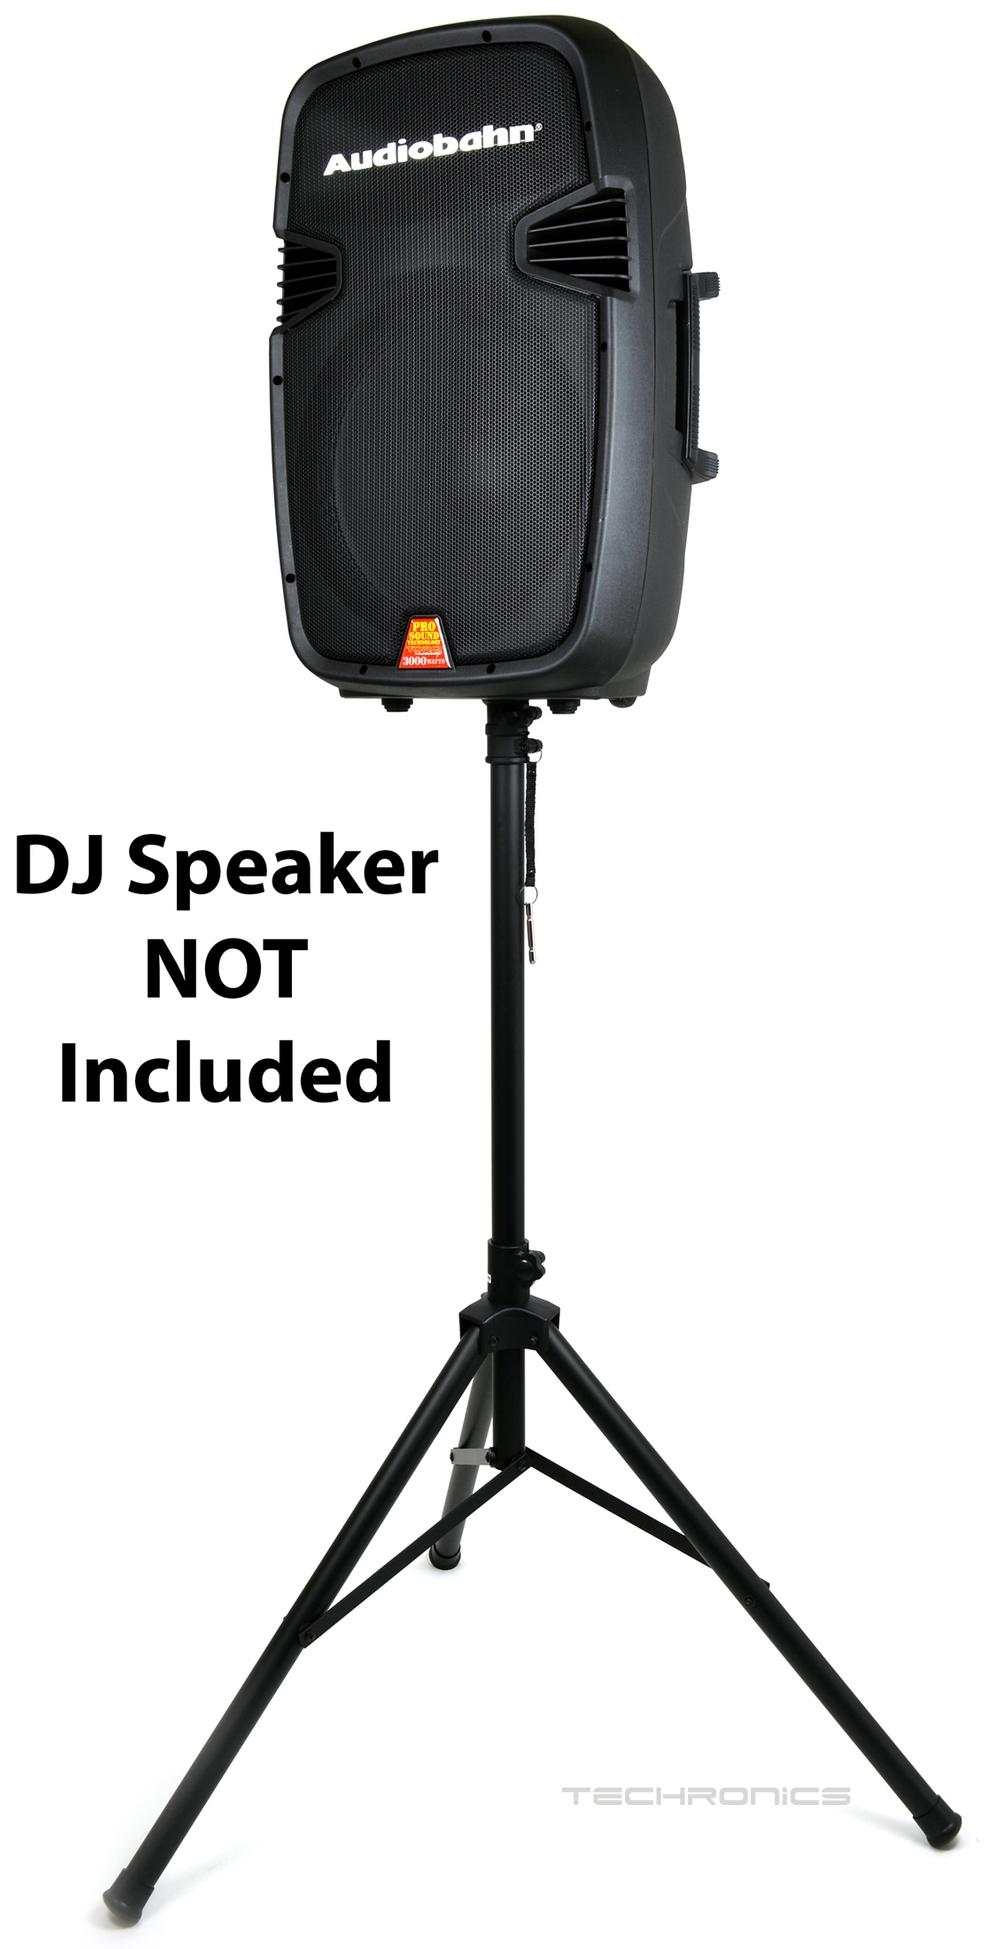 audiobahn universal durable heavy duty tripod for dj speaker equipment stand ebay. Black Bedroom Furniture Sets. Home Design Ideas